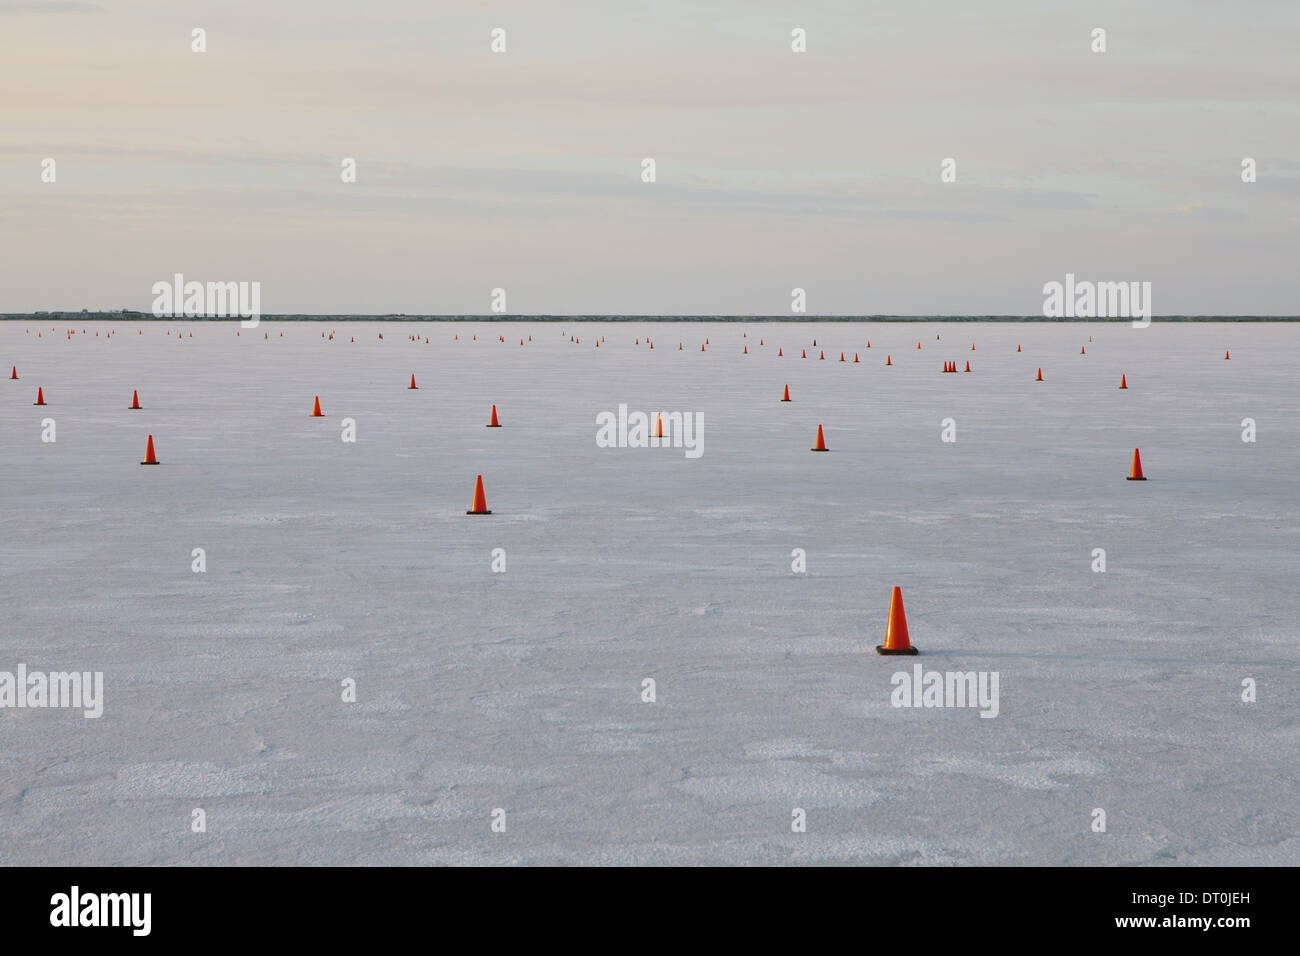 Bonneville Salt Flats Utah USA Traffic cones on race course Bonneville Speed Week - Stock Image